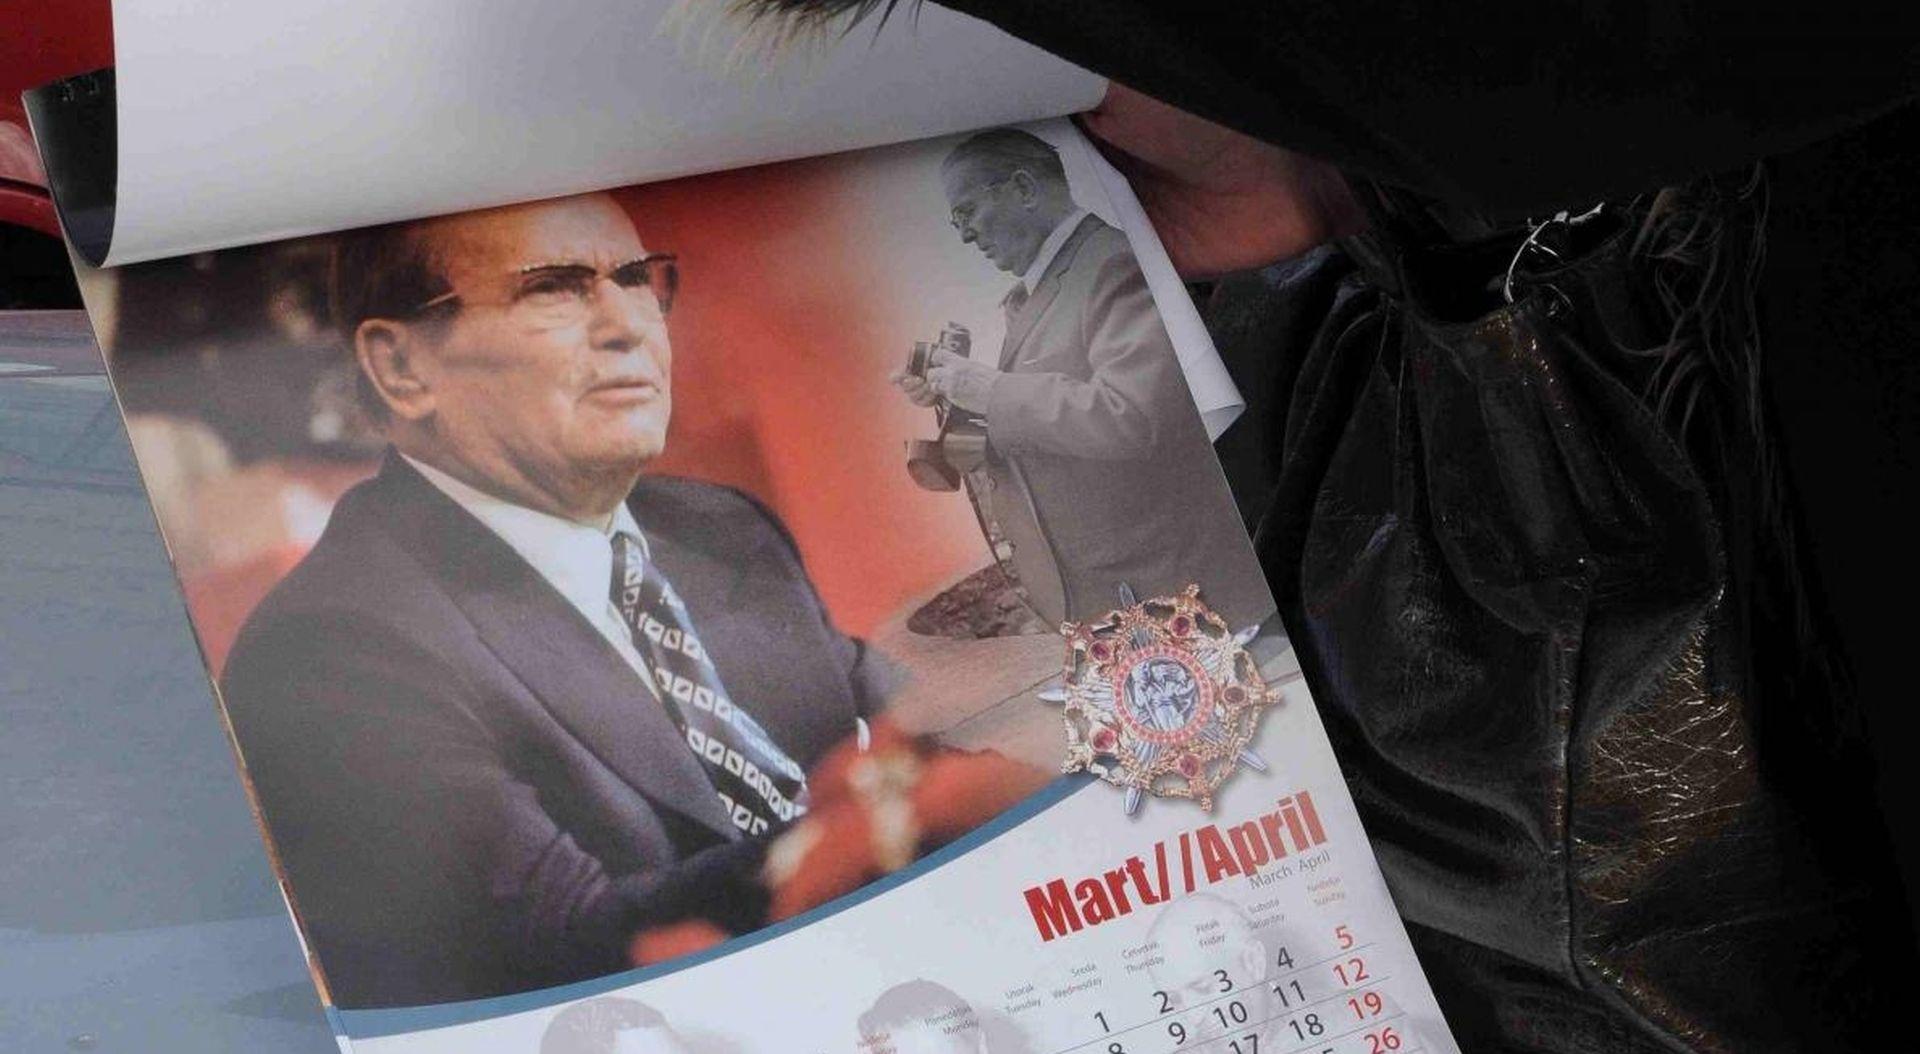 Titov prsten na ruci zagrebačkog biznismena